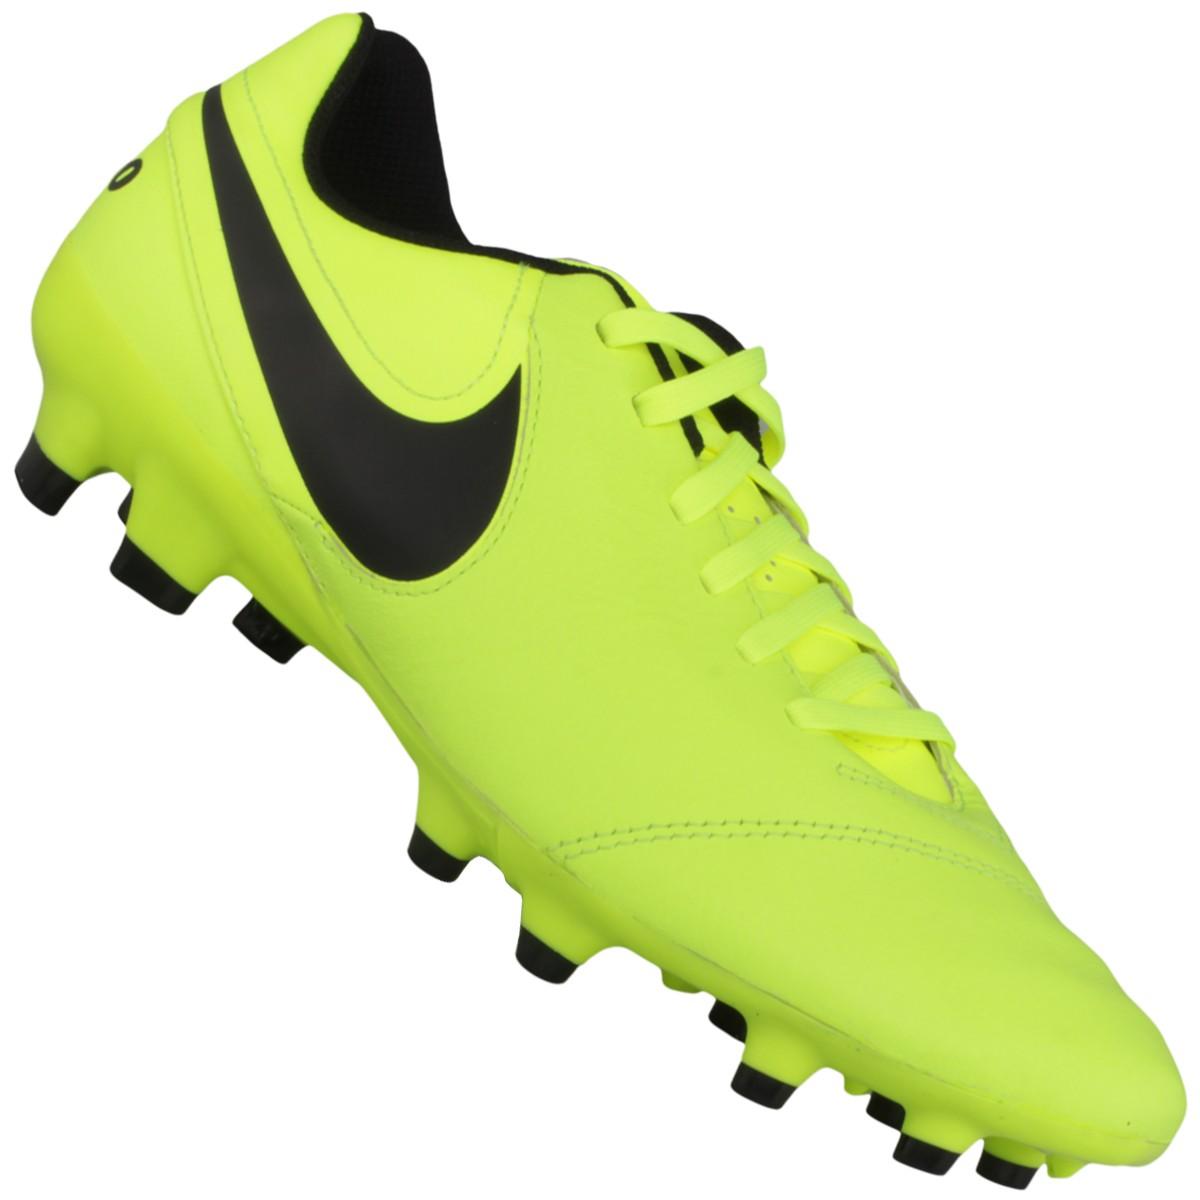 Chuteira Nike Tiempo Genio 2 Leather FG Campo b38e08a76e579